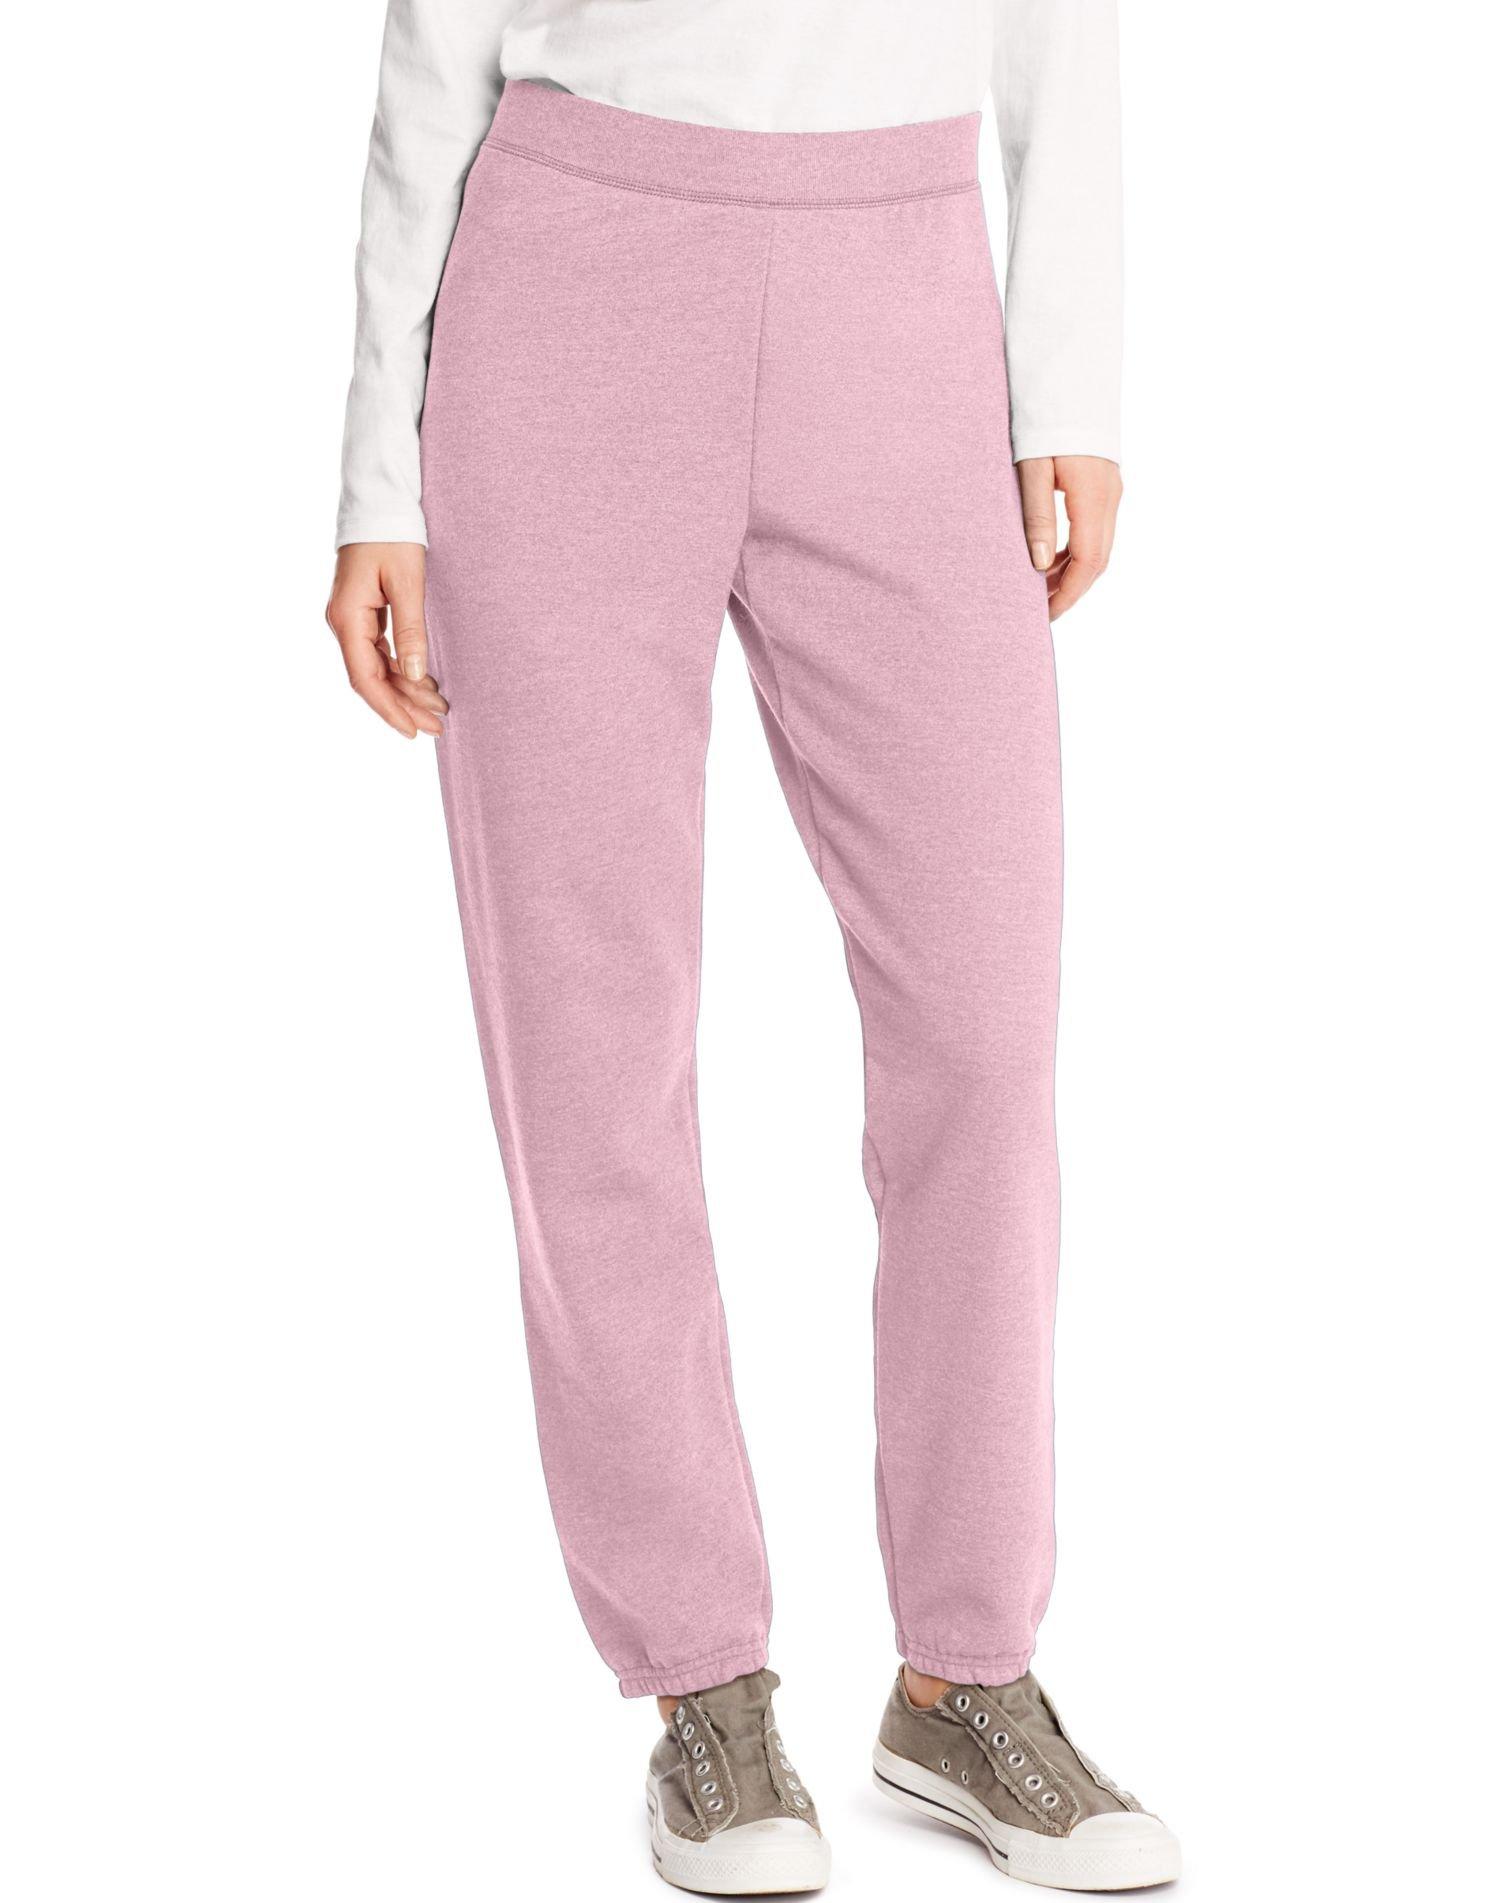 Hanes Women's Mid Rise Cinch Leg Pant, Pale Pink, Small